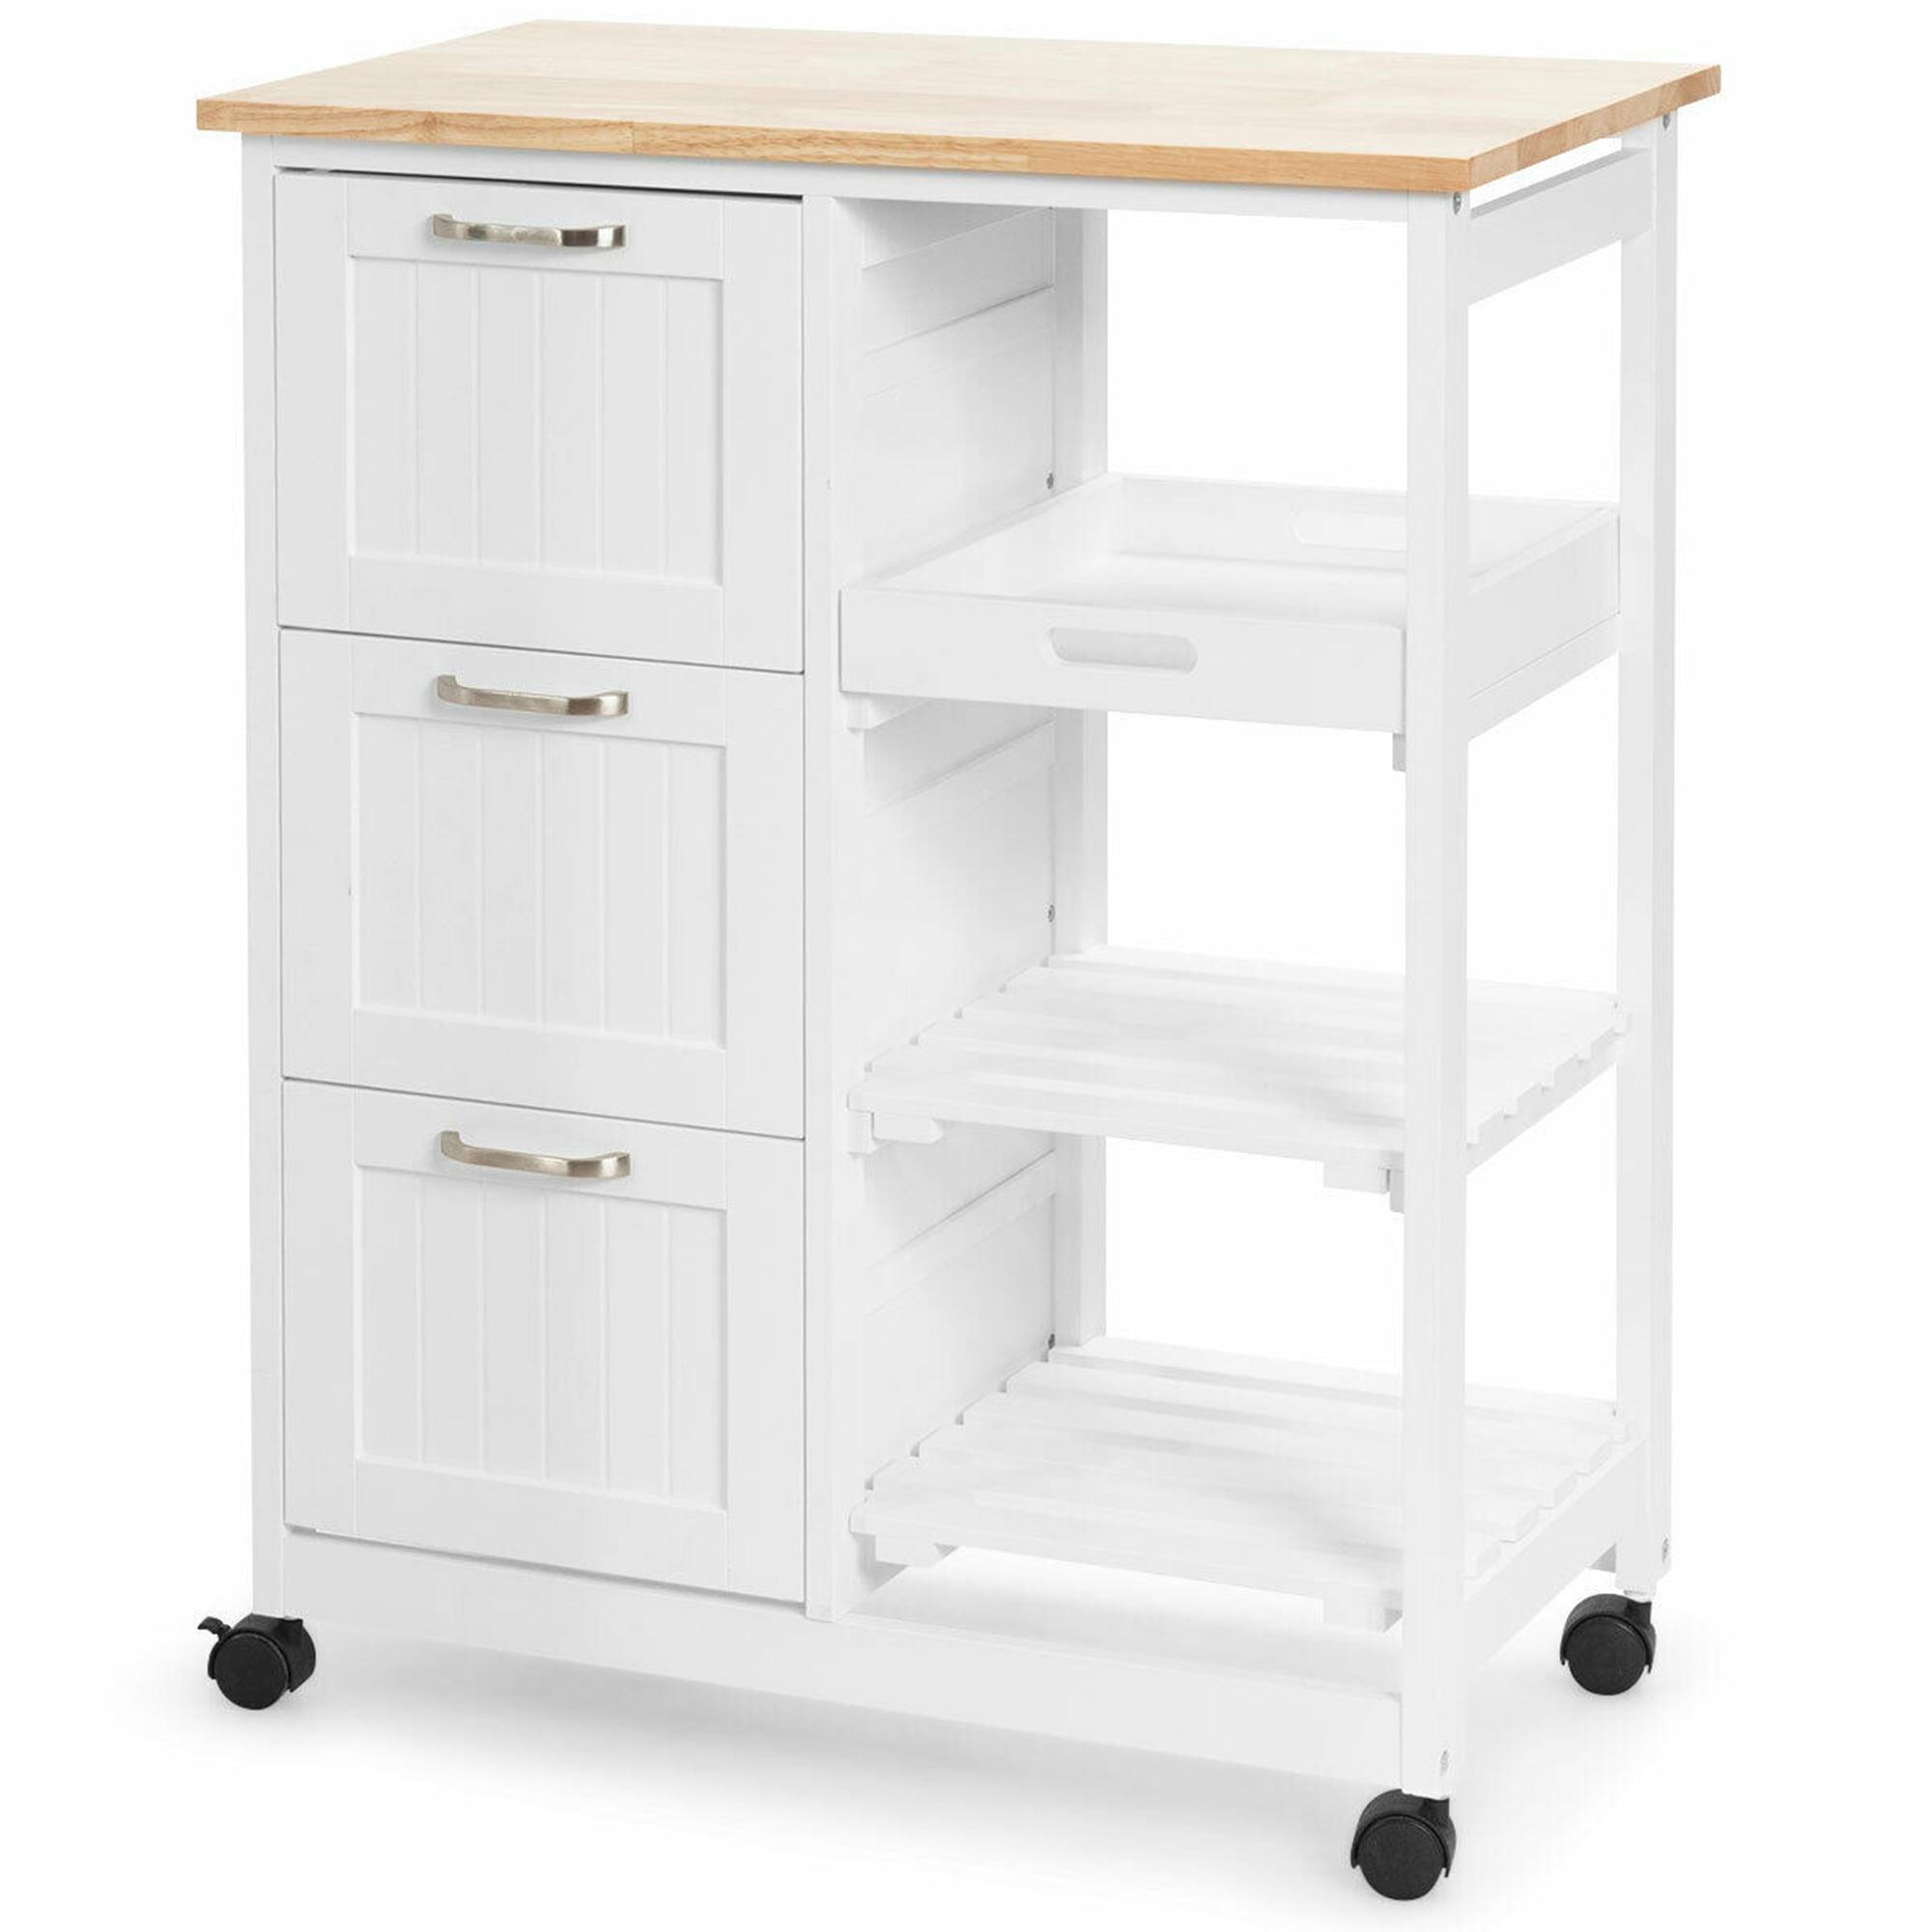 Gymax Rolling Kitchen Island Utility Storage Cart W 3 Storage Drawers Shelves White Walmart Canada